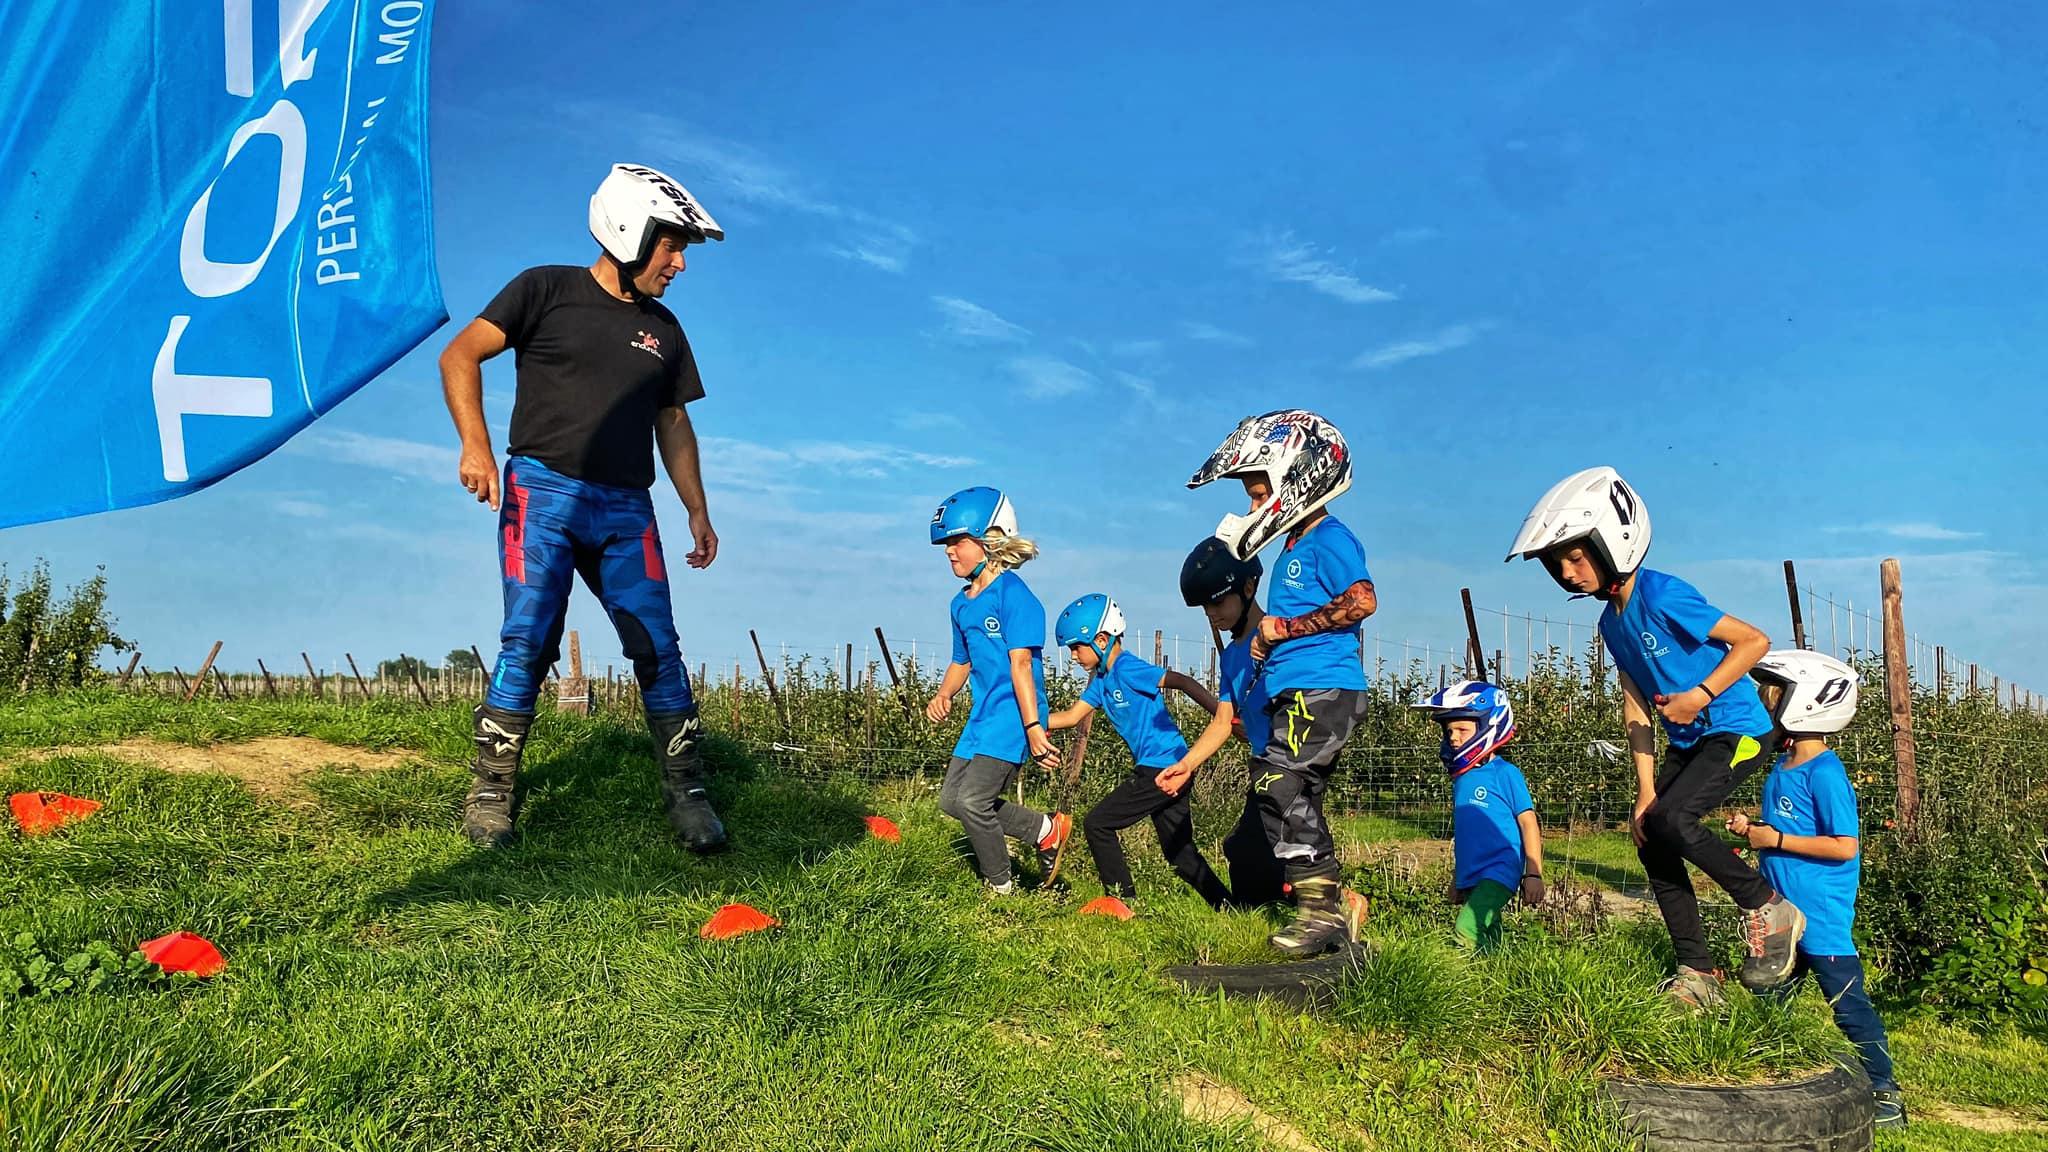 Torrot kids school - by Endurofun - actie 14